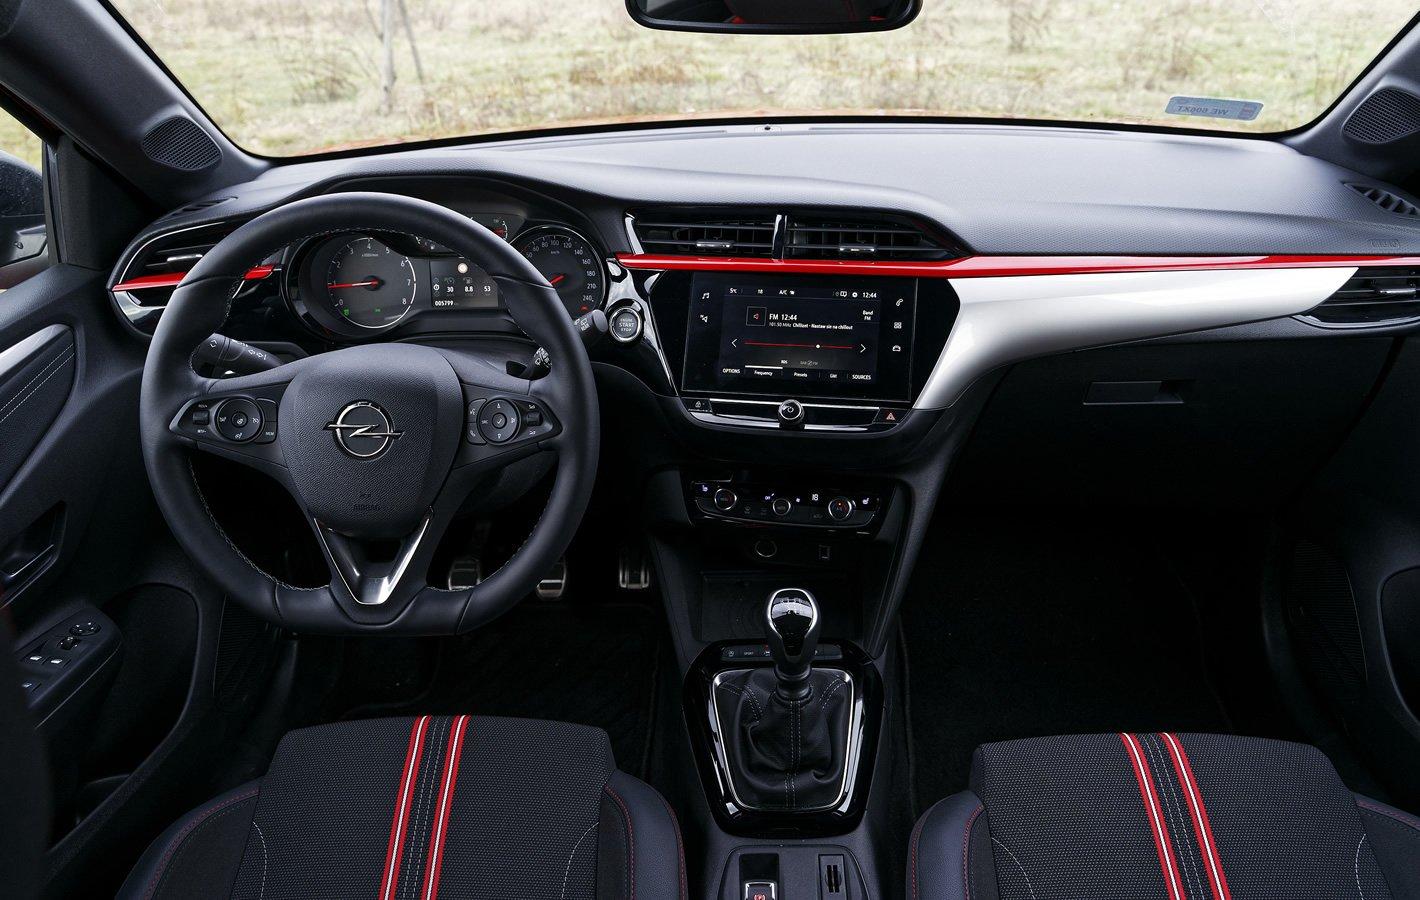 Opel Corsa 1.2 Turbo GS-Line